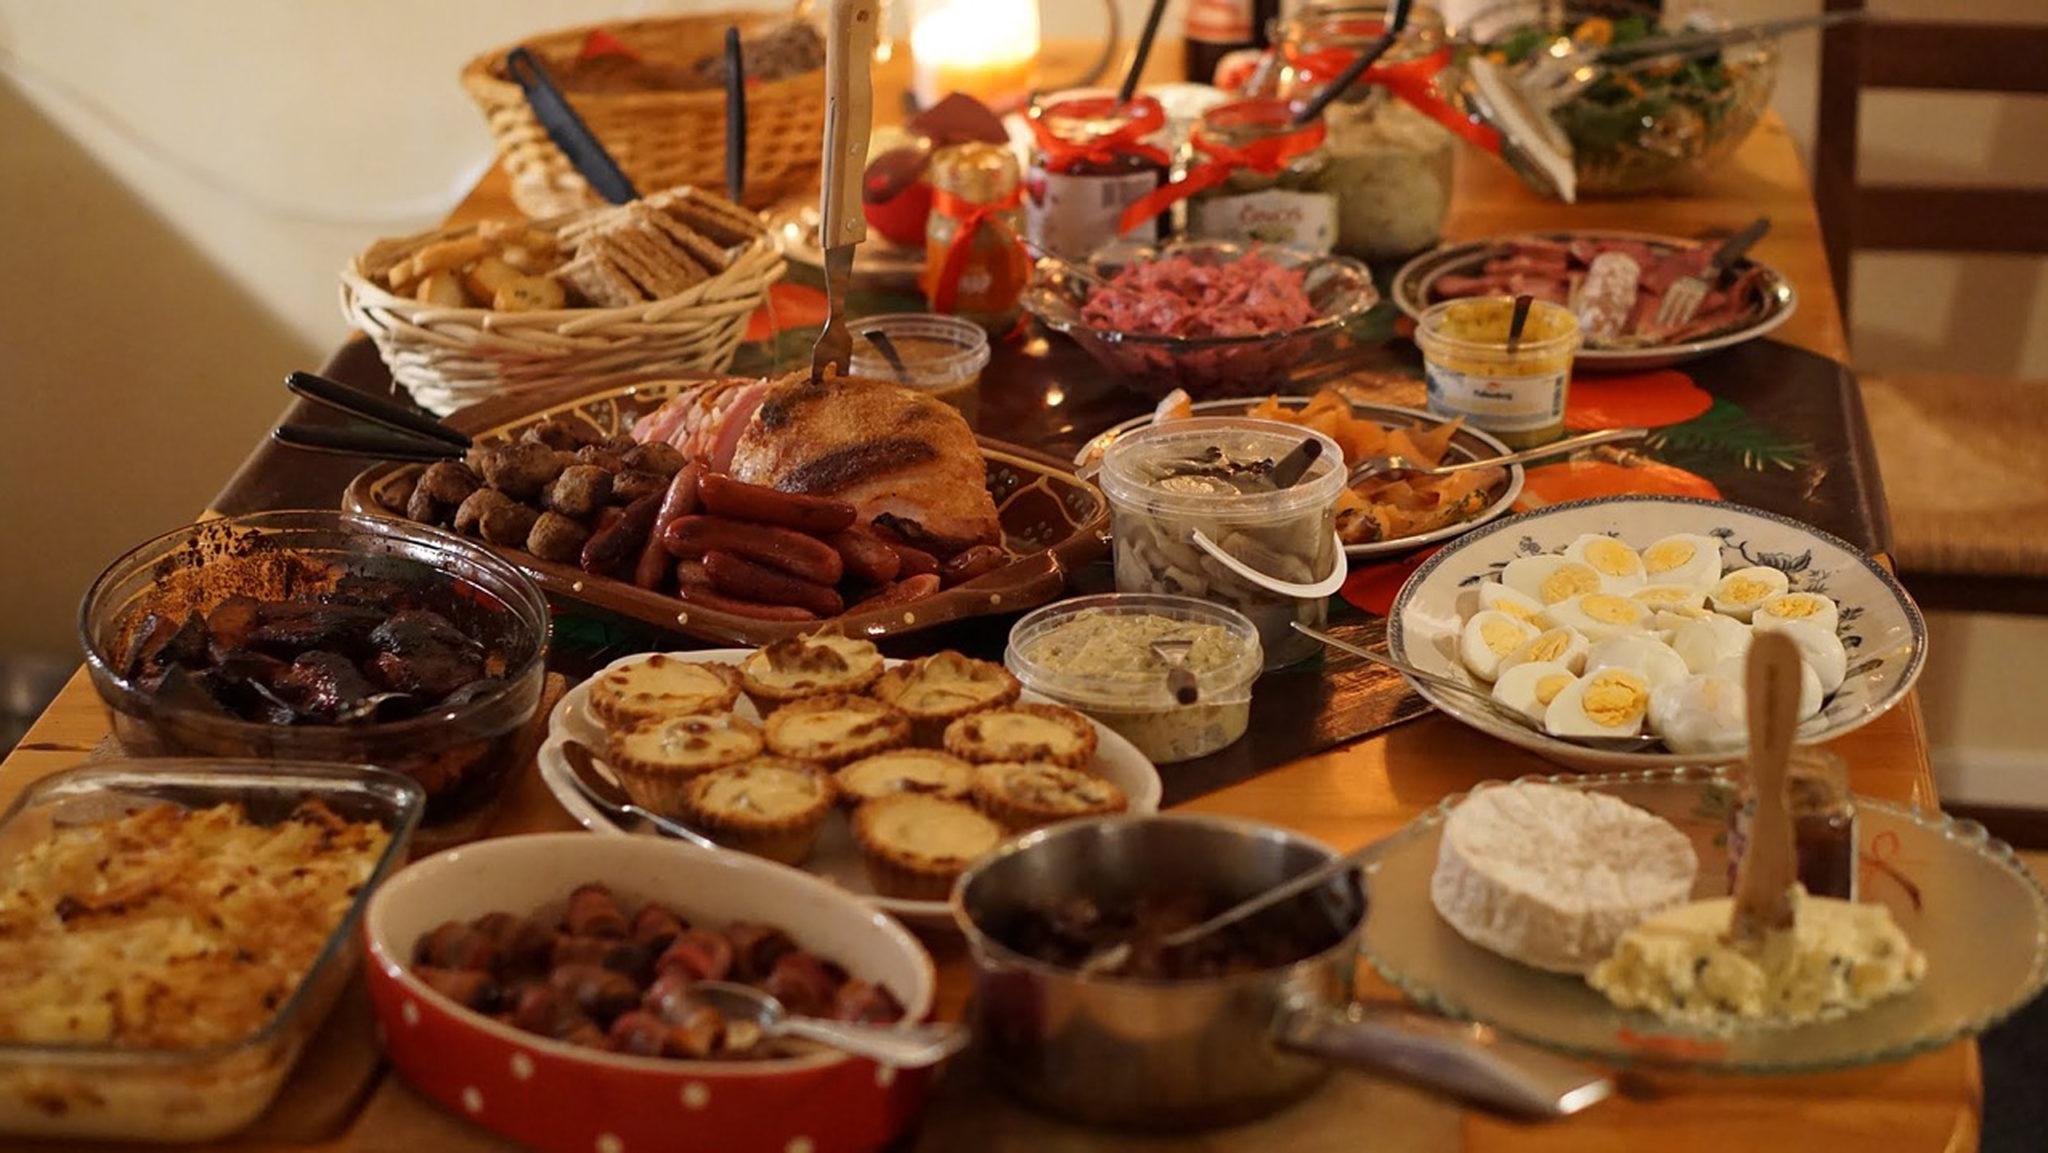 cena navideña, festín navideño